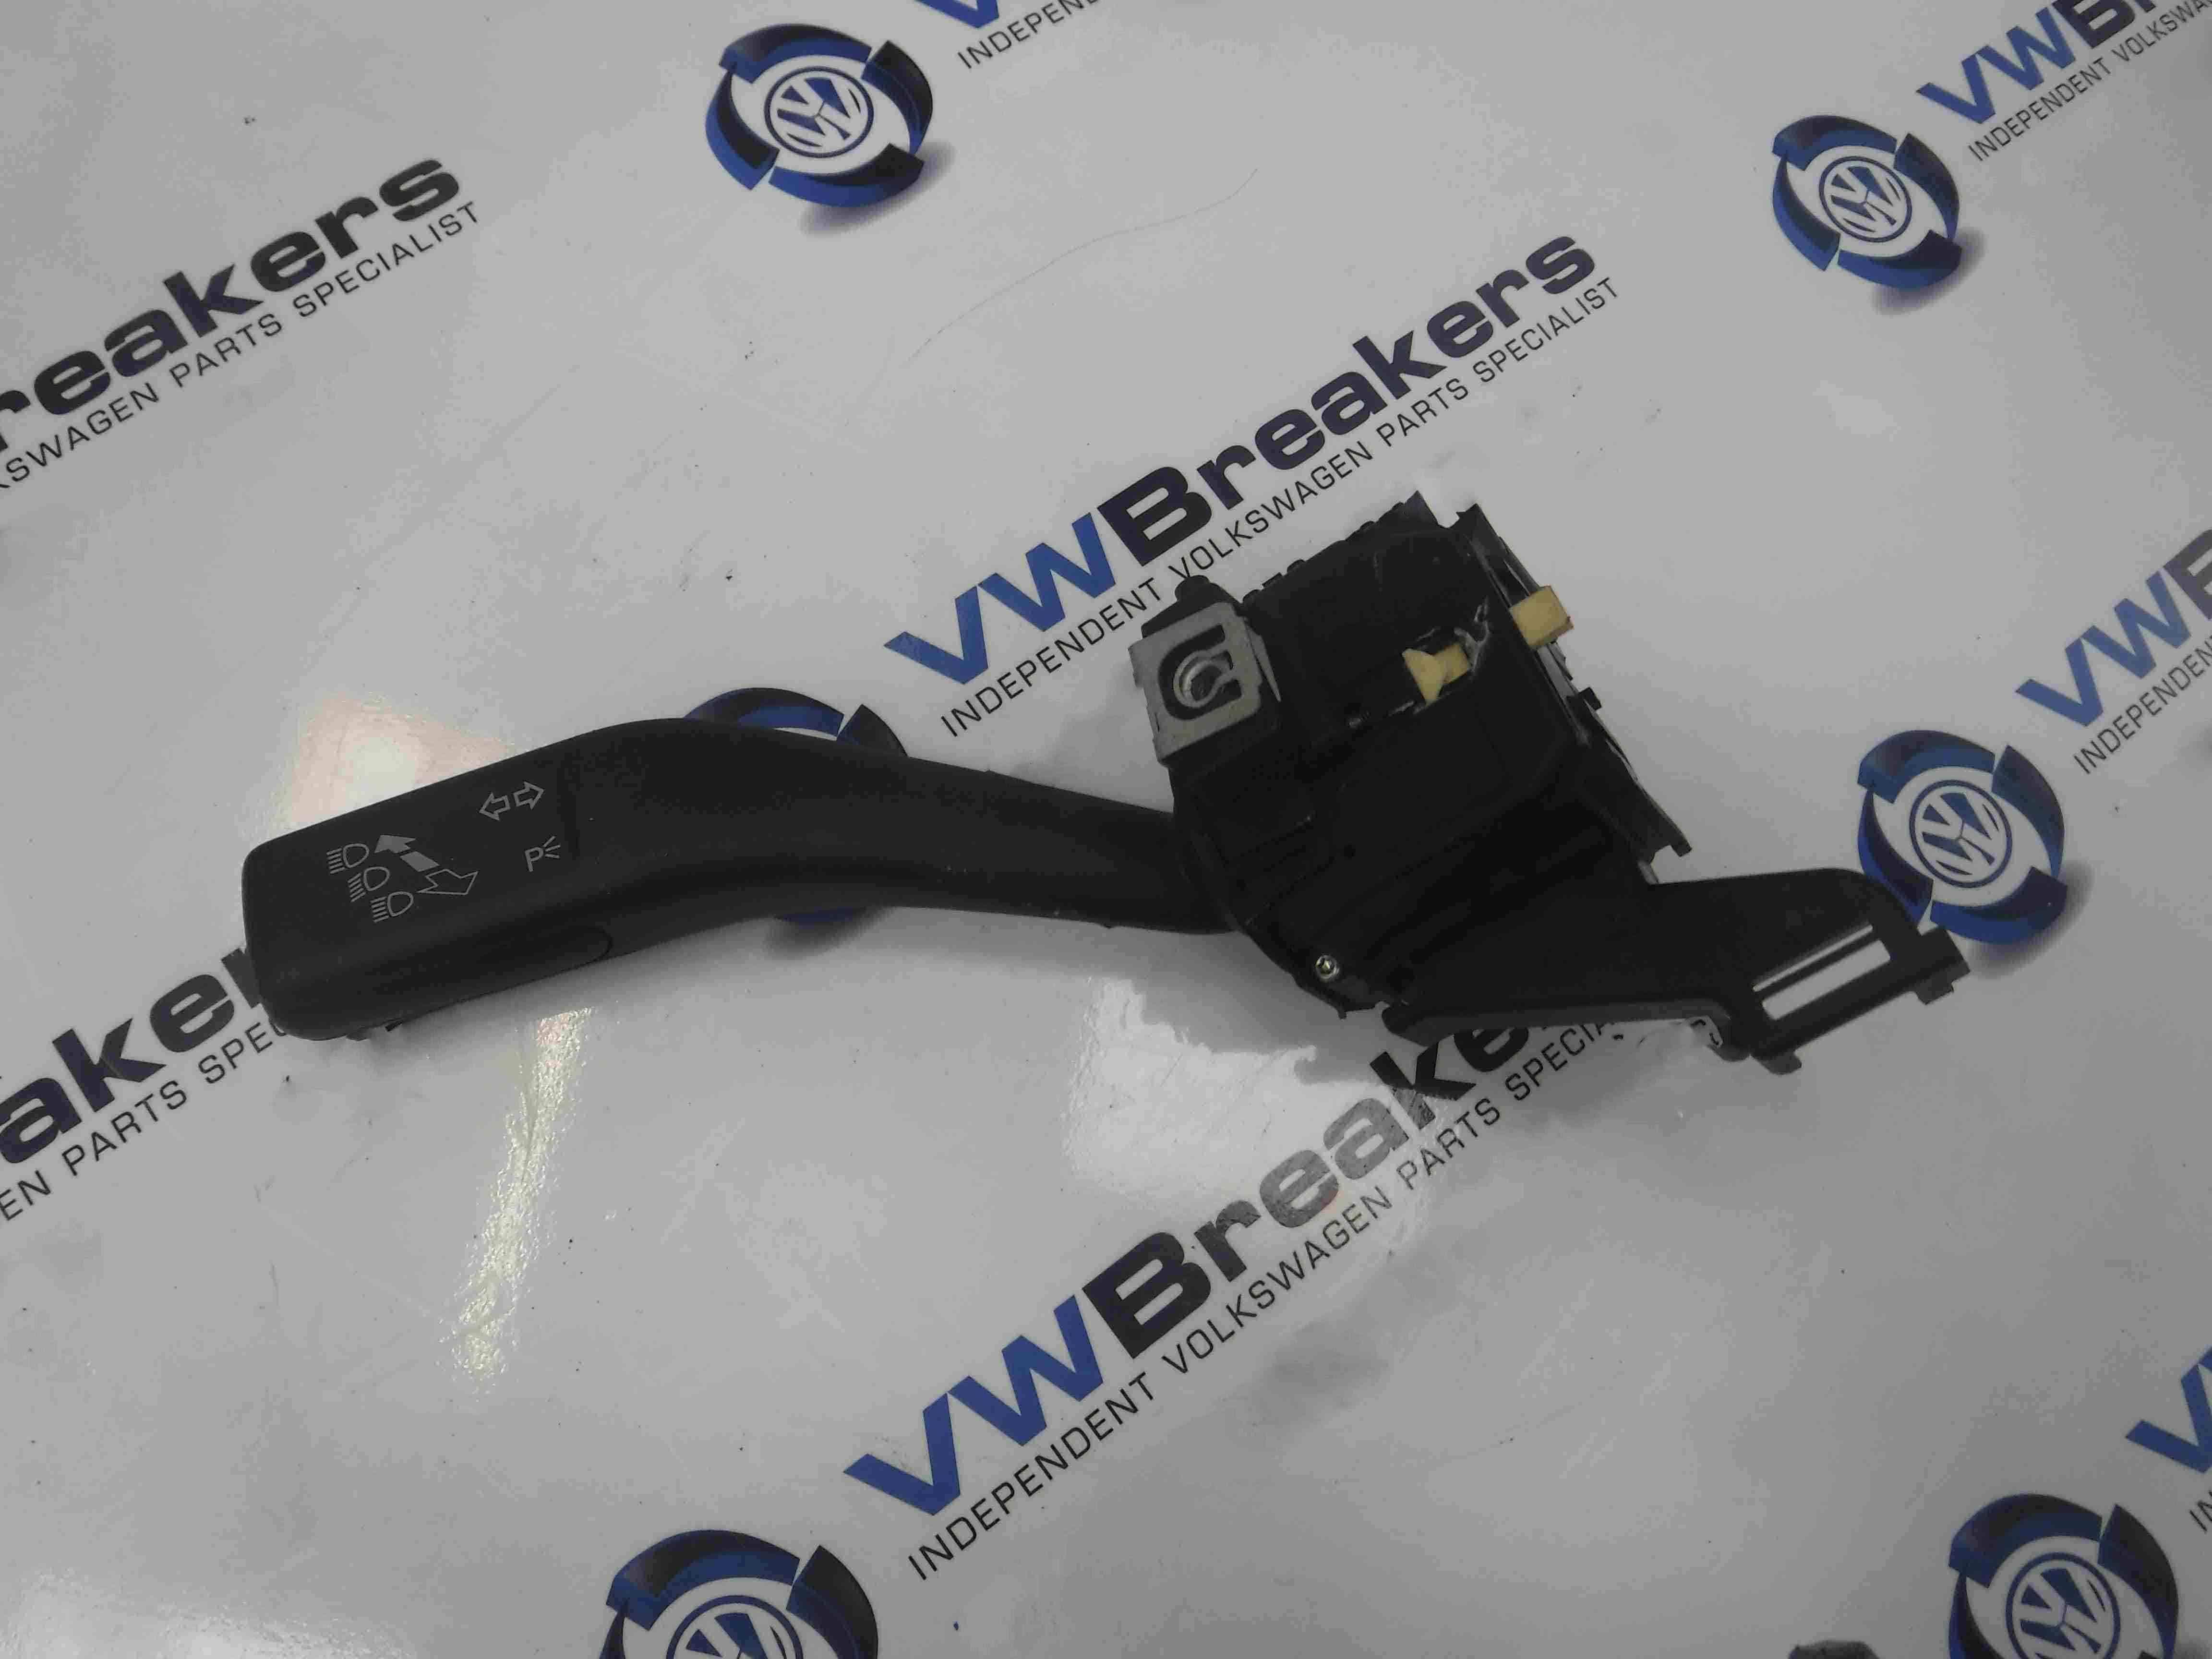 Volkswagen Golf MK5 2003-2009 Headlight Indicator Stalk 1K0953513E